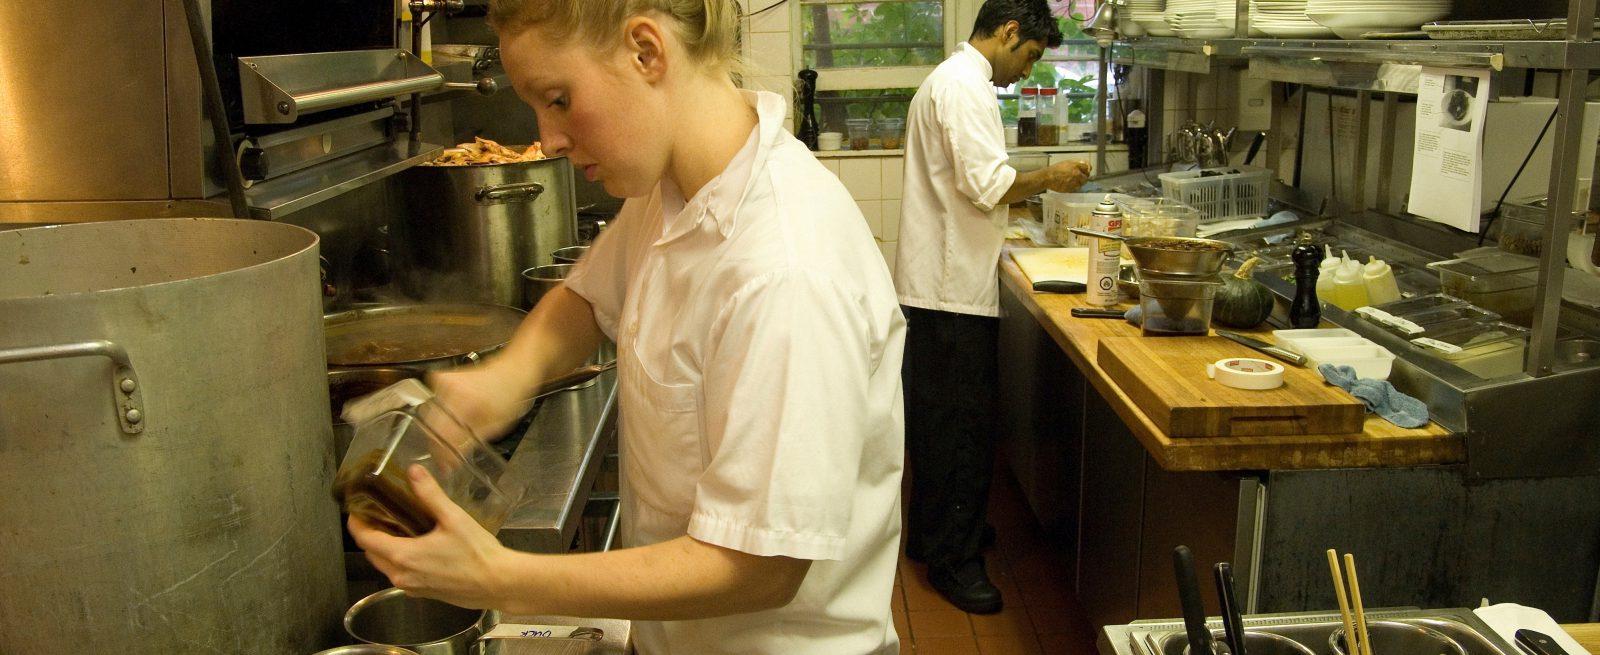 Anatomy of a Foodborne Illness Epidemic | Modern Restaurant ...